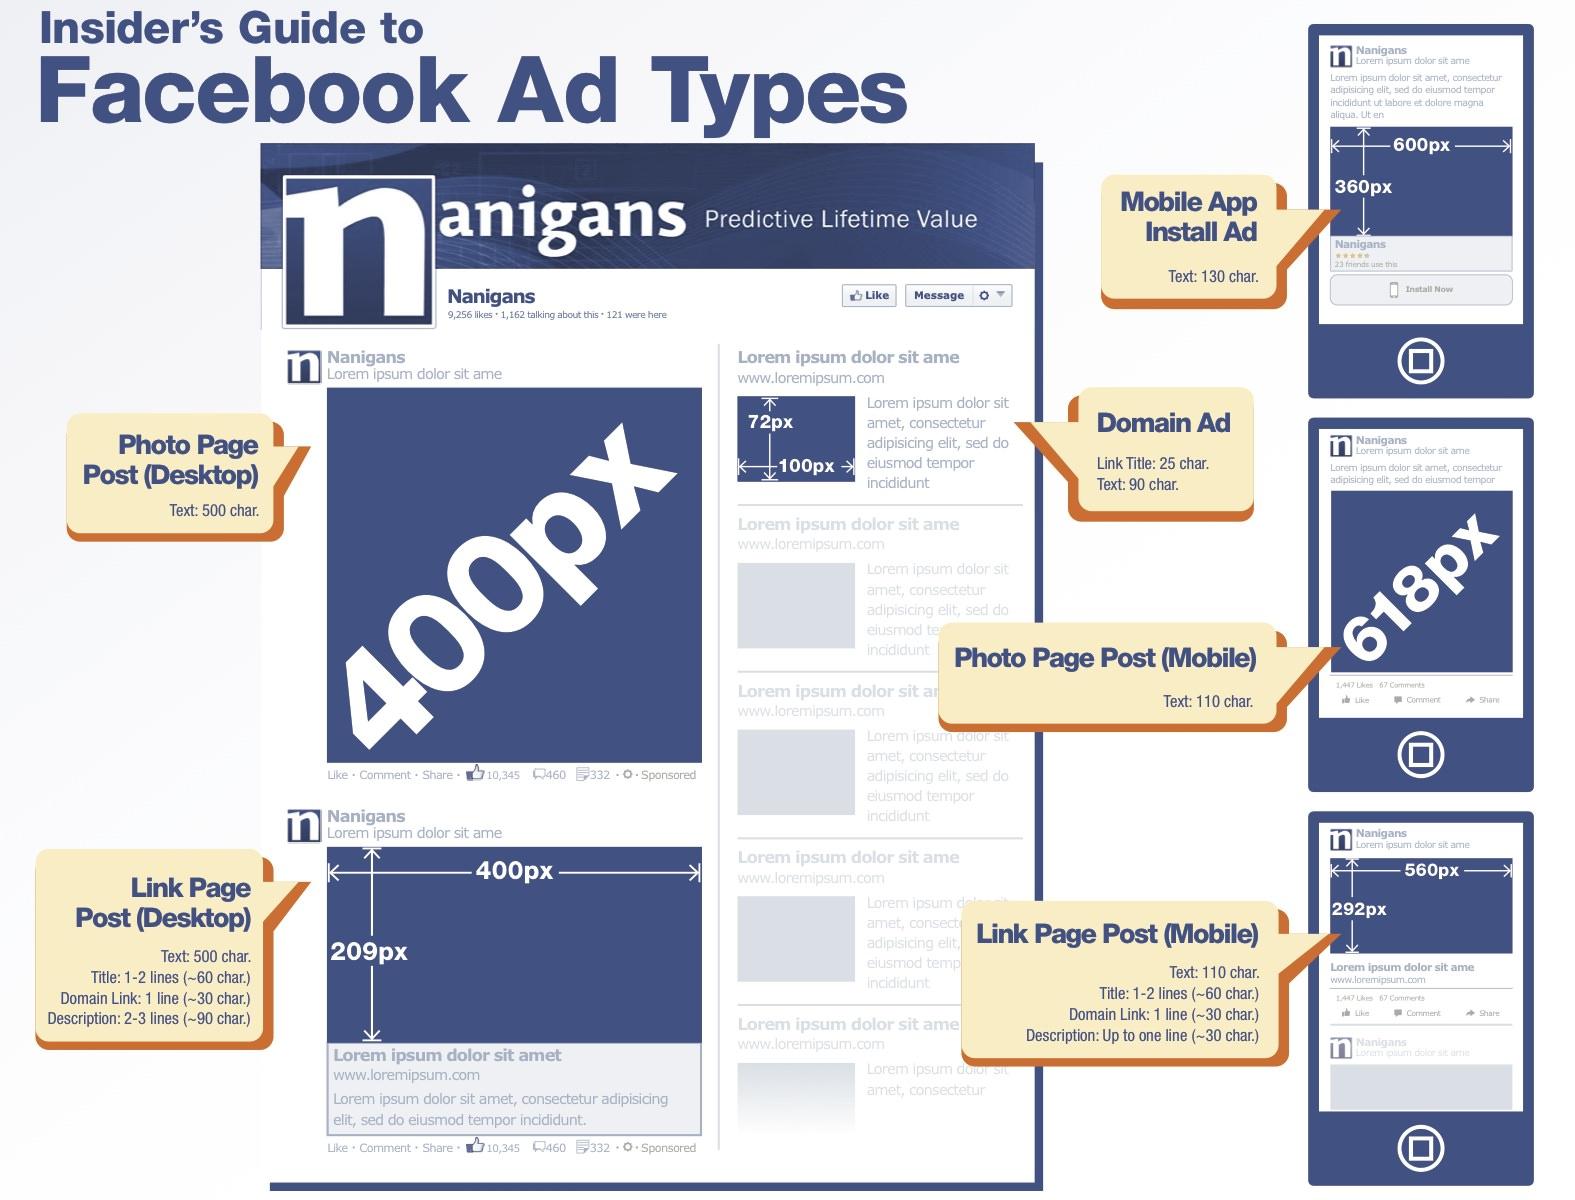 Facebook-anuncios-infografia-nanigans